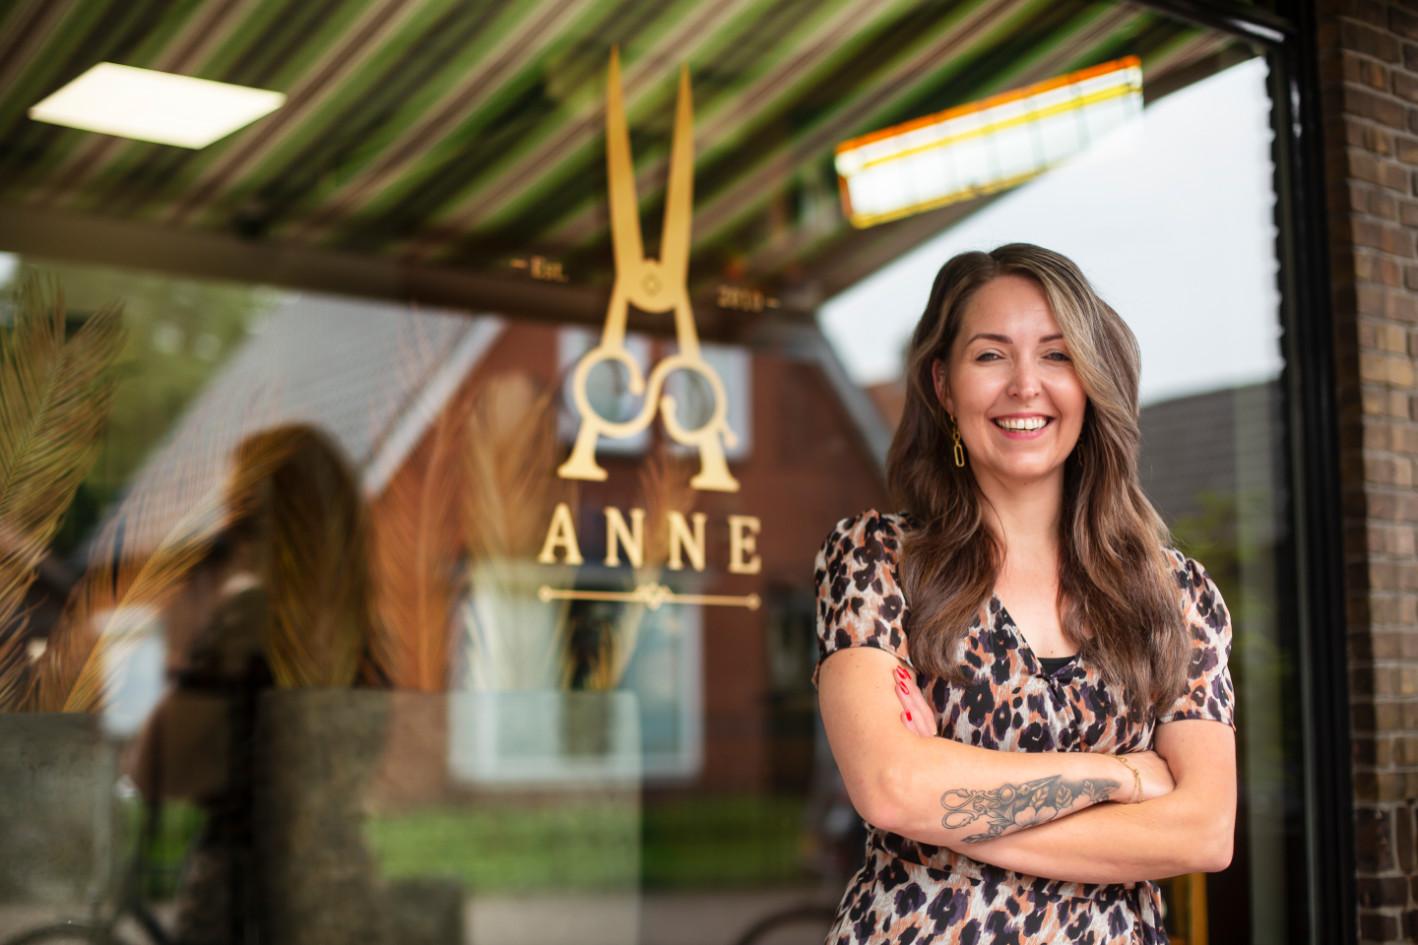 Kapster Annemarie voor haar kapsalon 'ANNE'